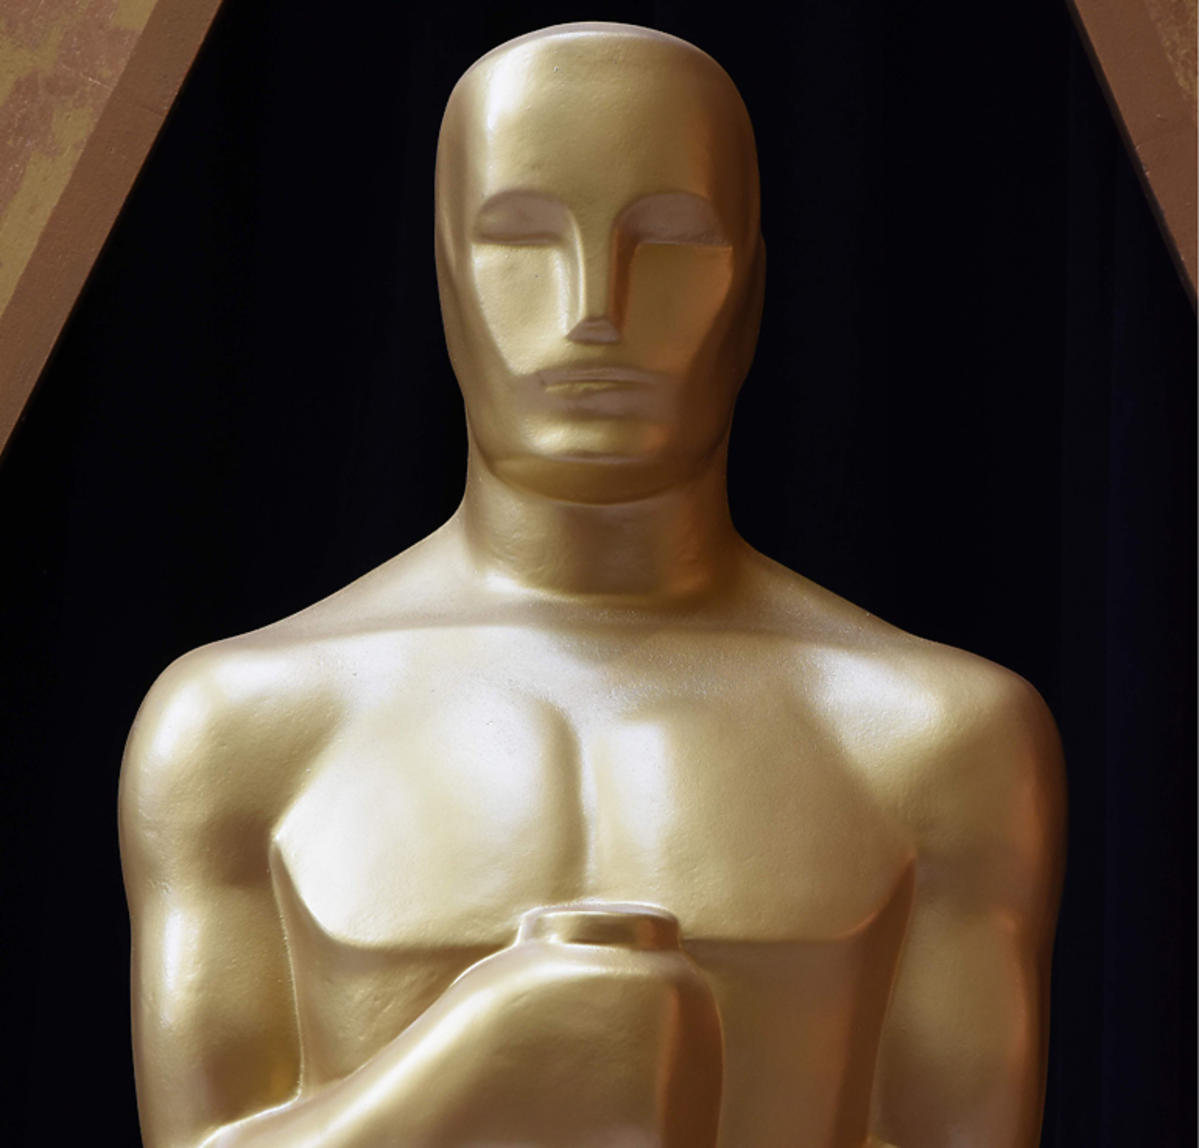 Oscary statuetka